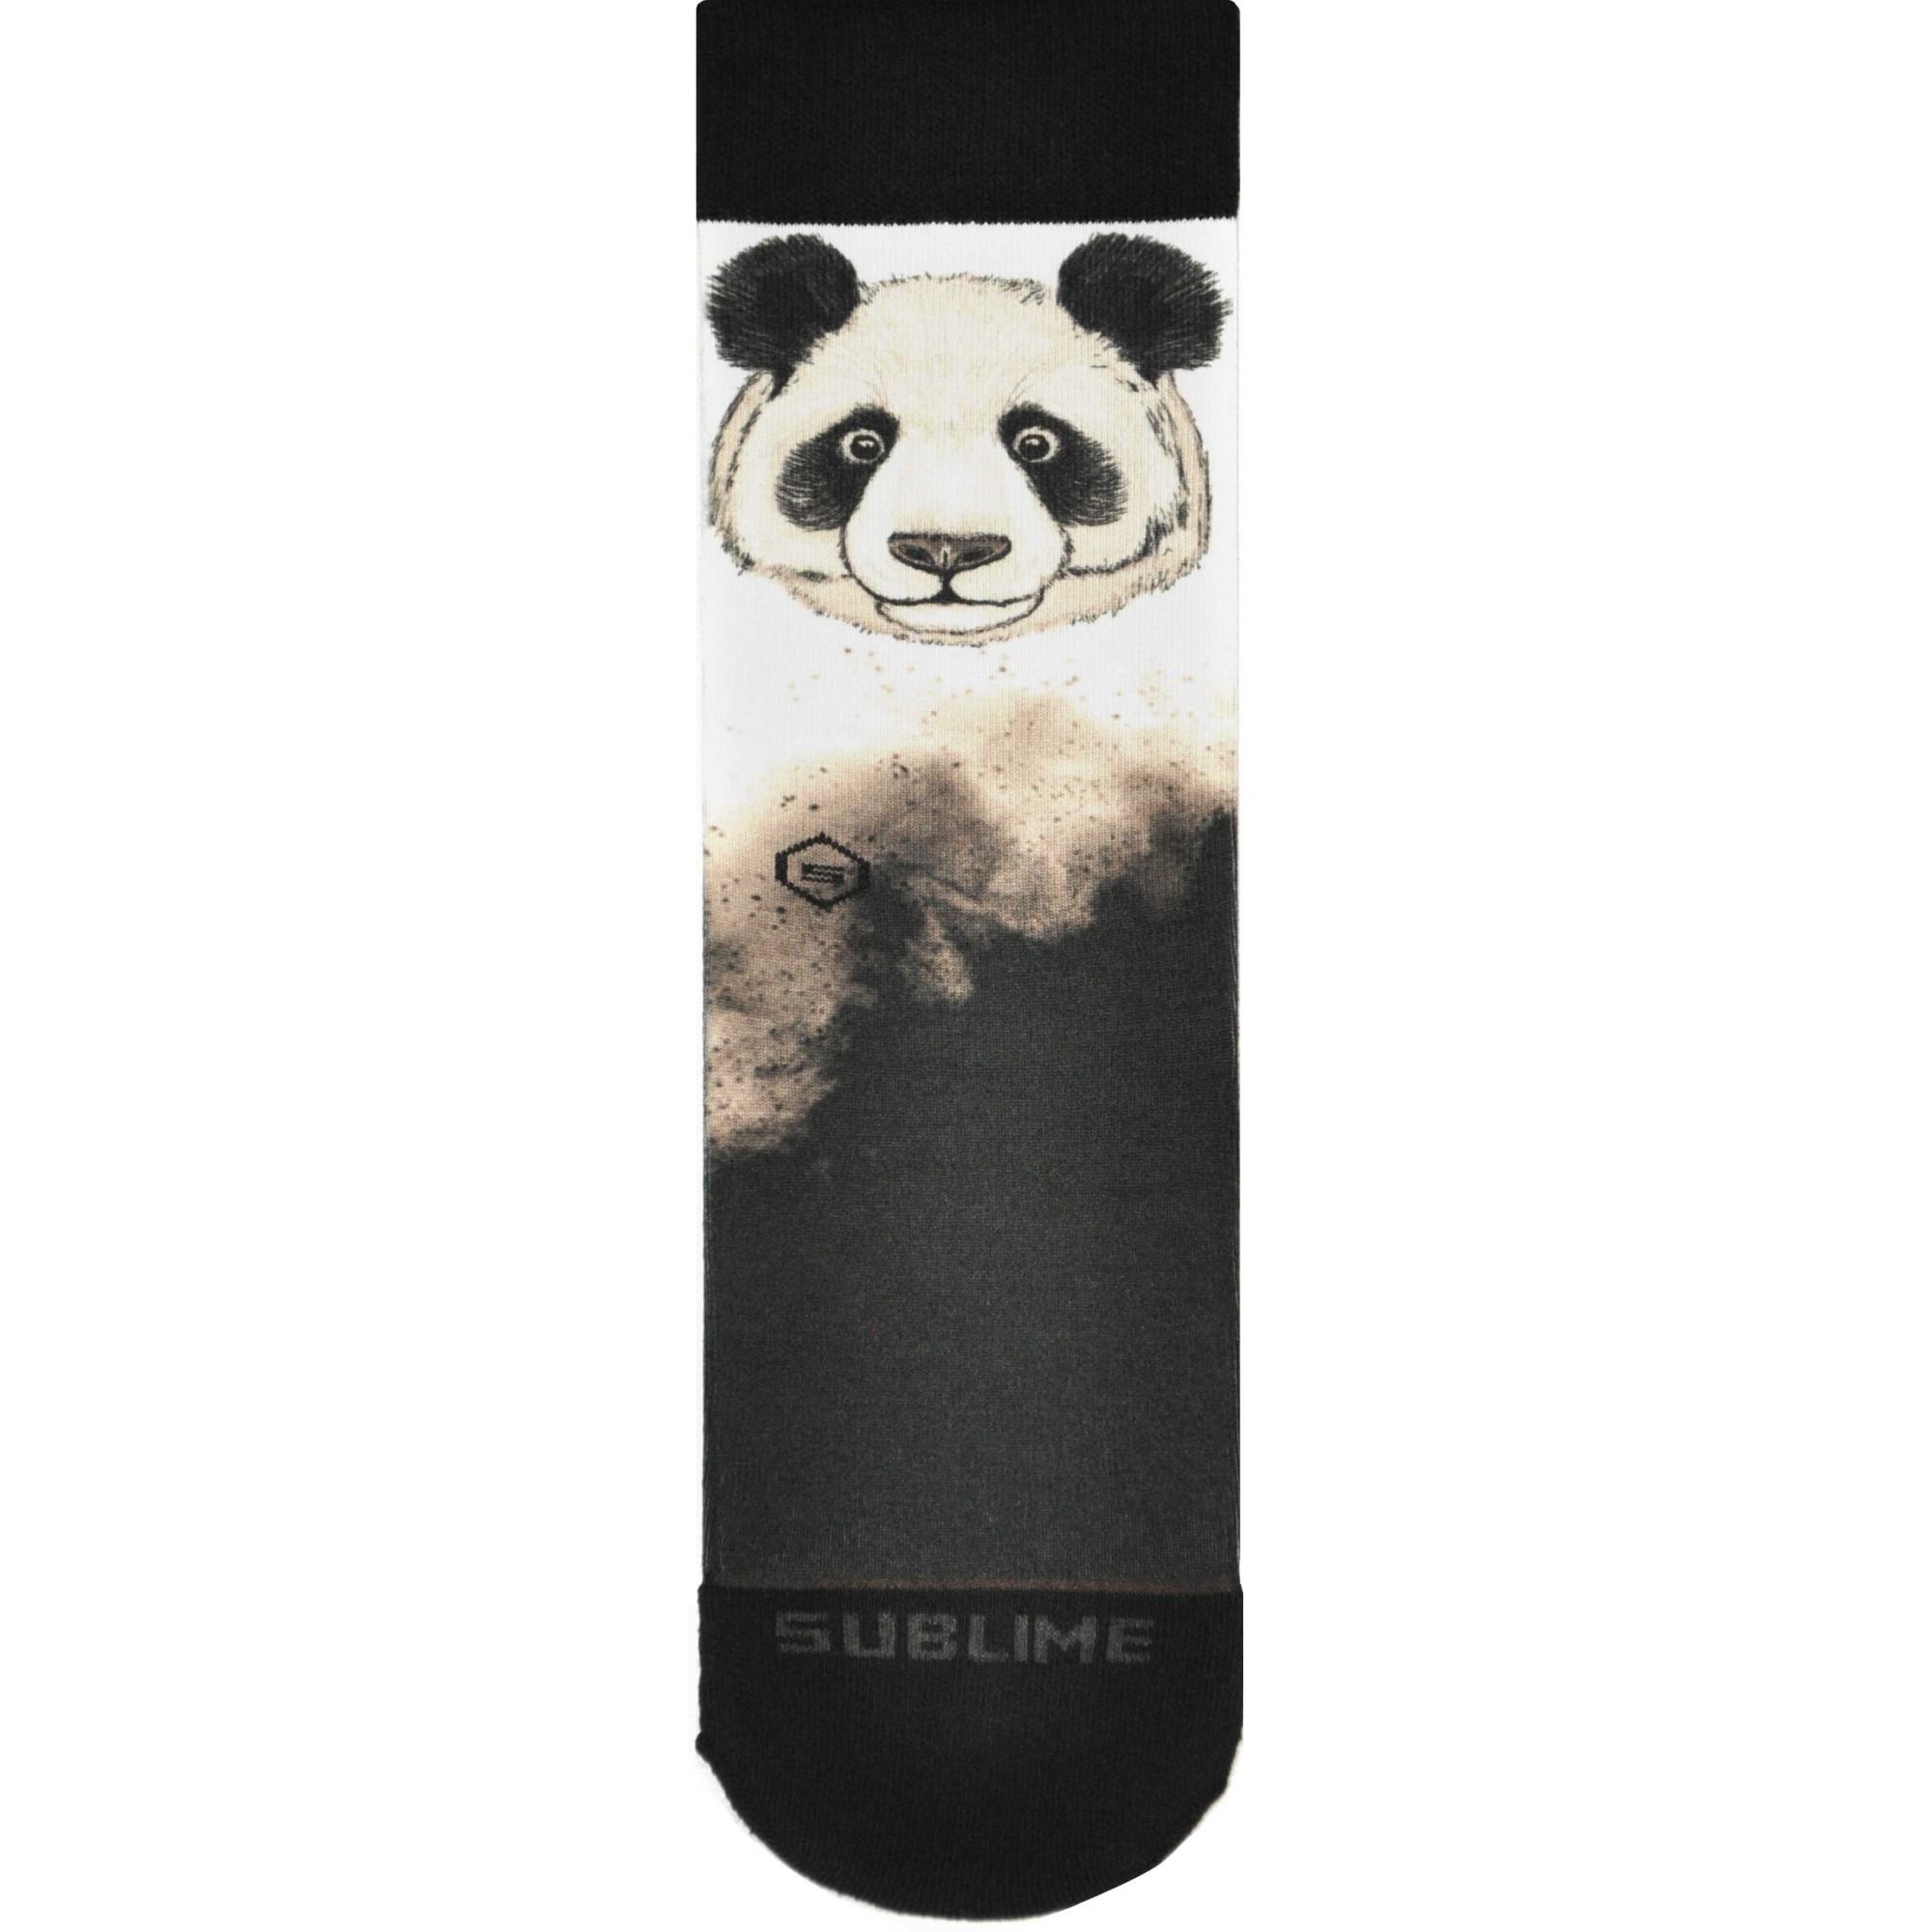 Meia Sublime Panda P&B